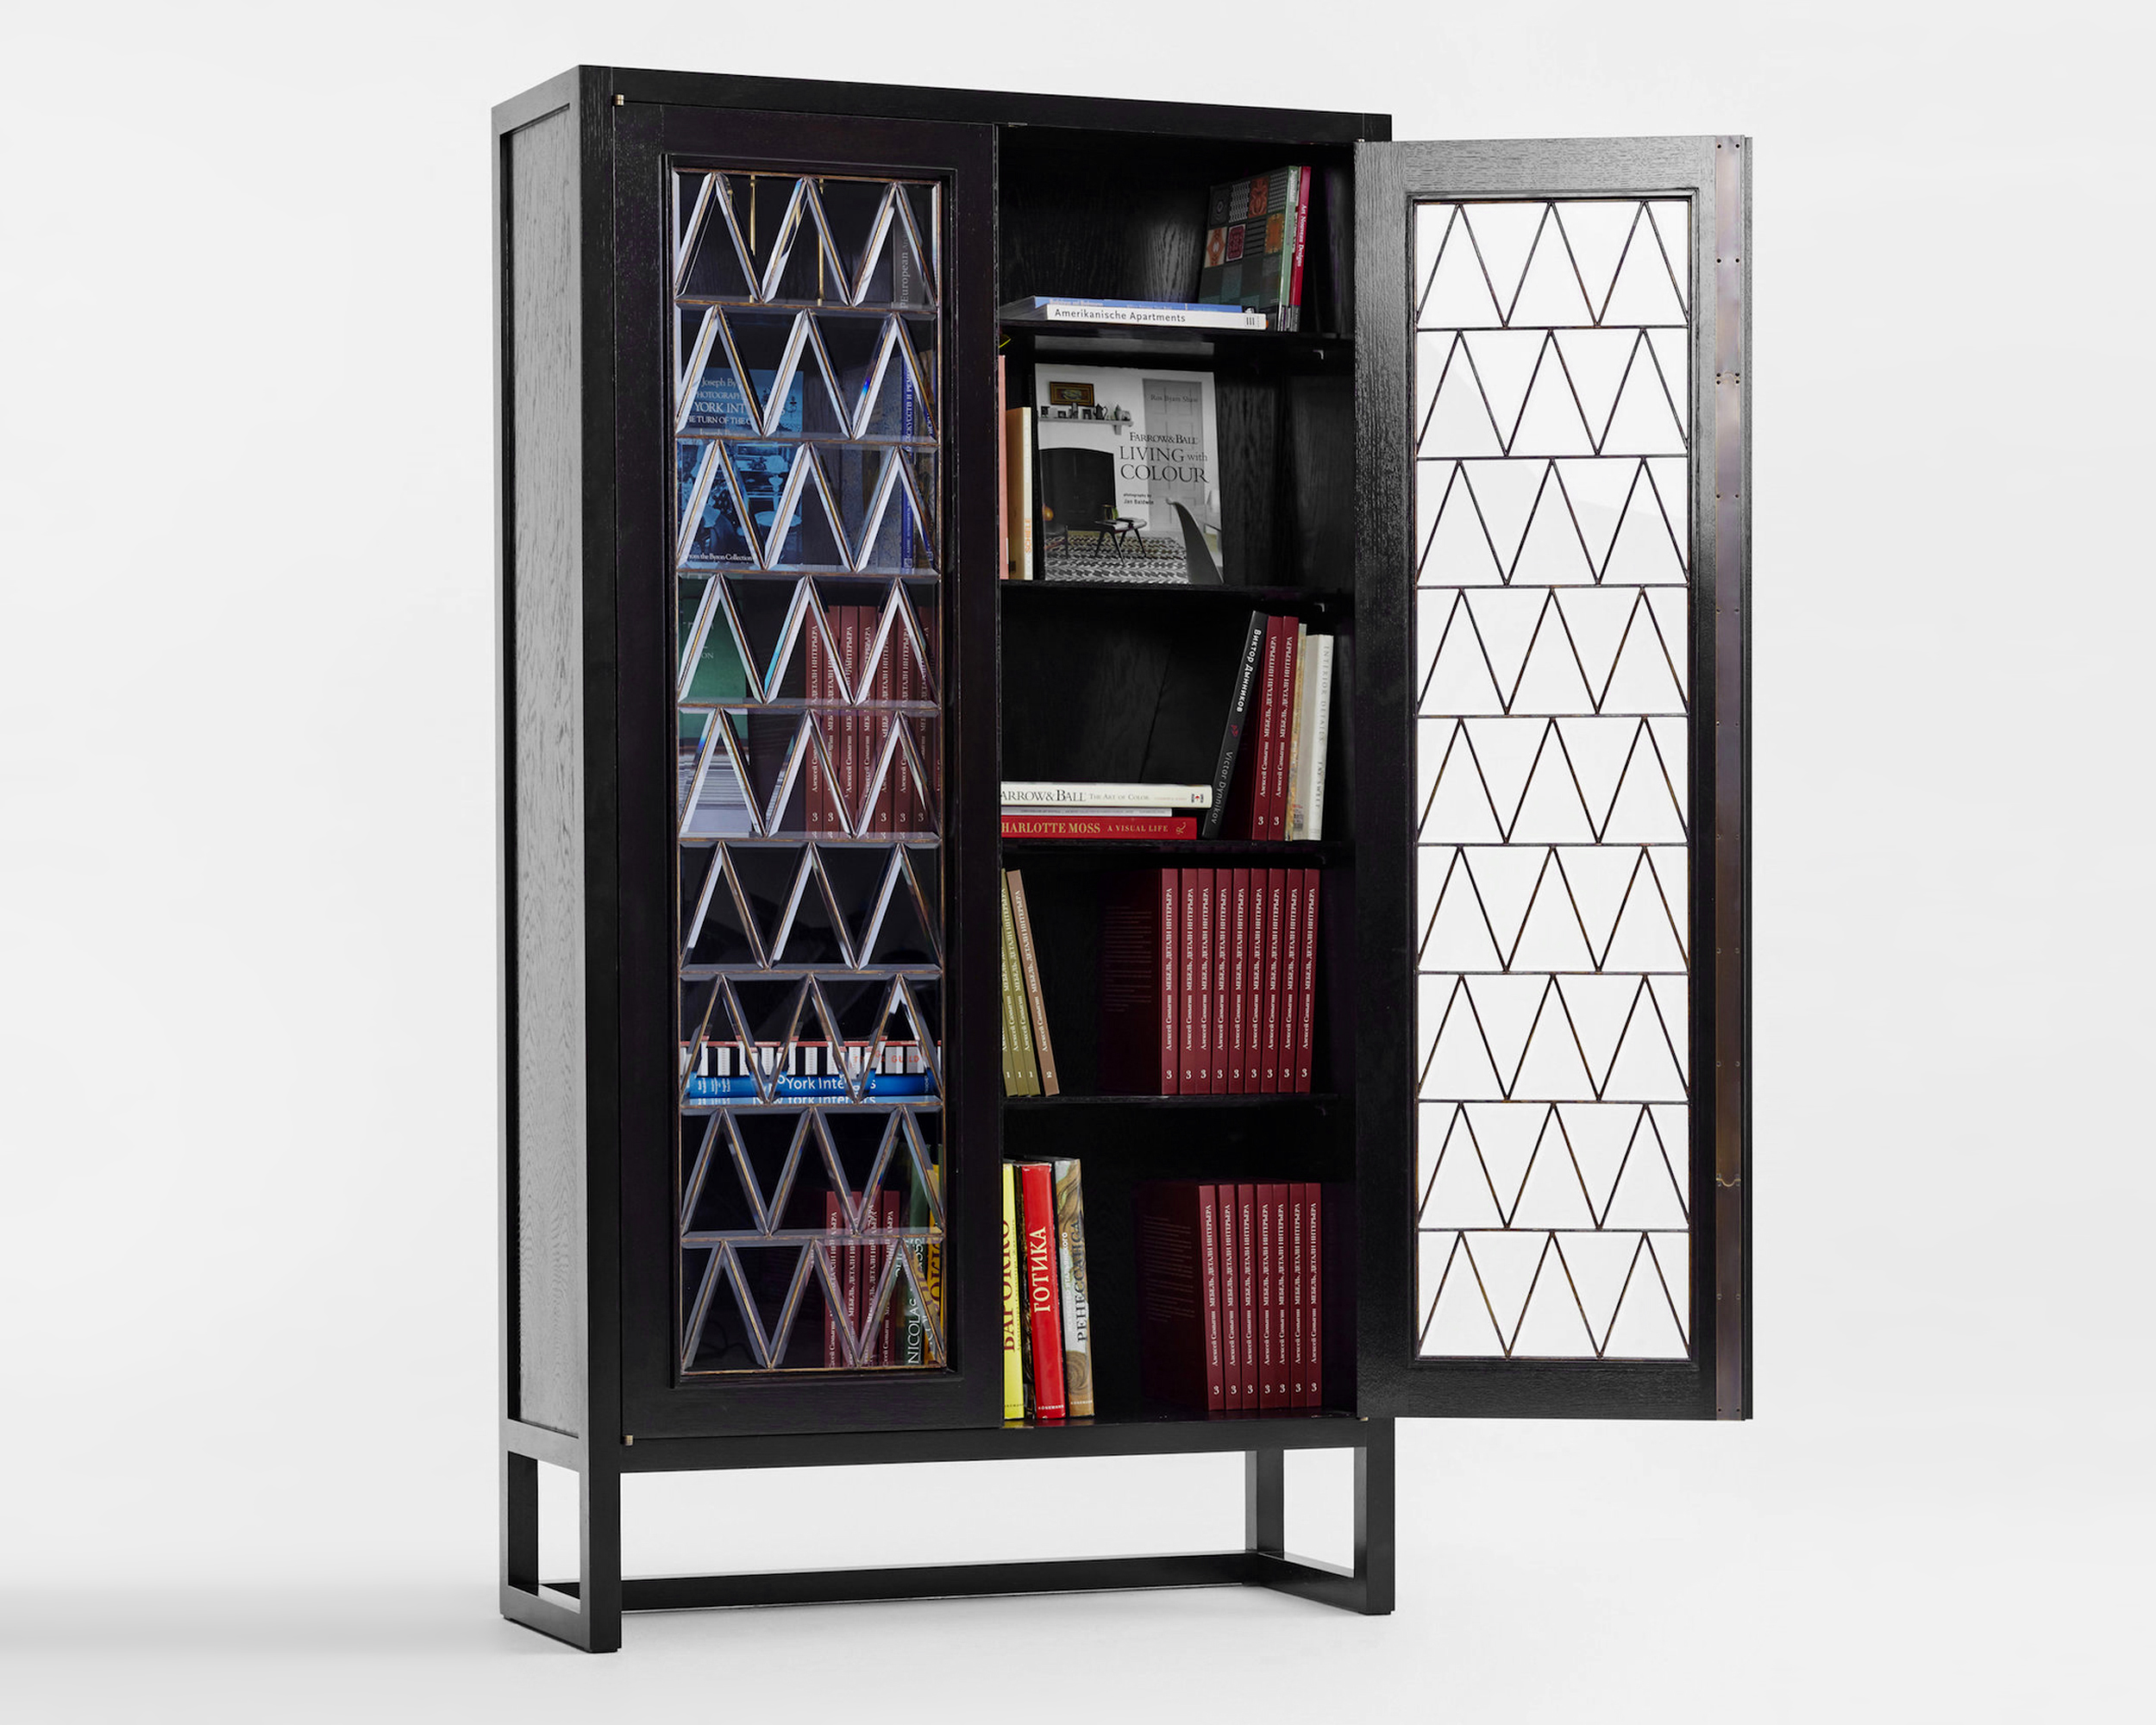 TriangleBookcase-DmitrySamygin-SavannahBay-Galler-1